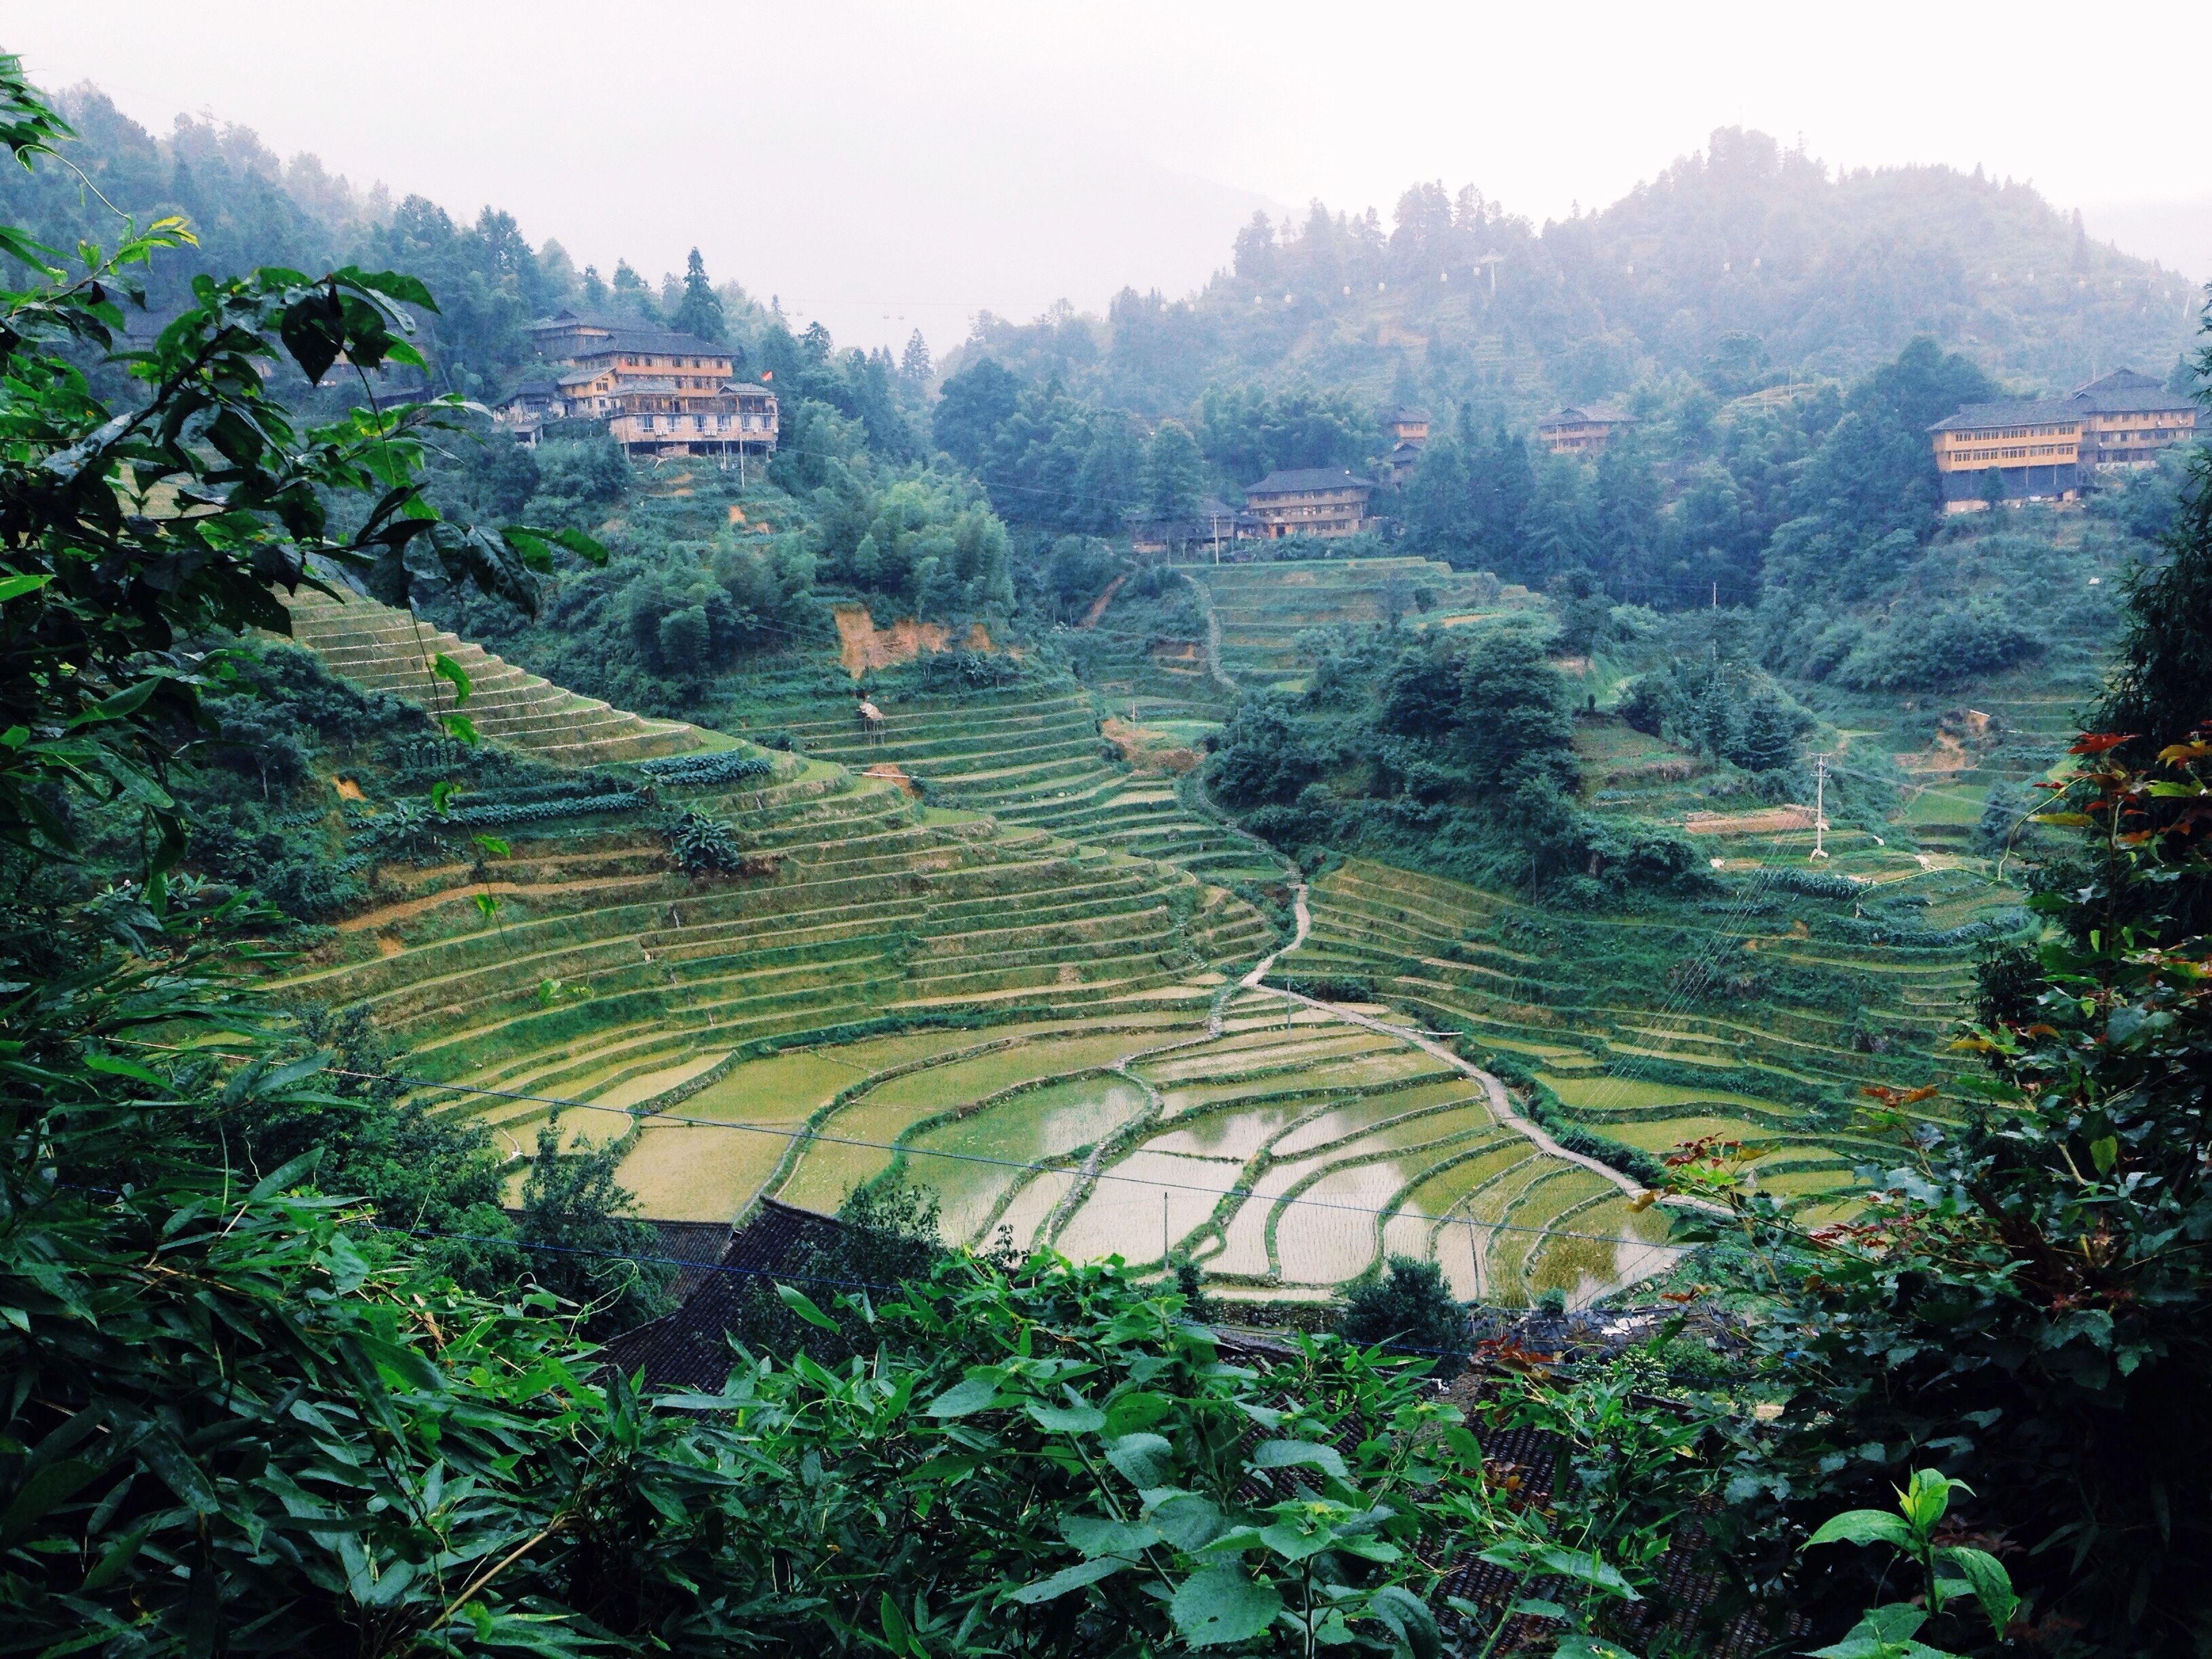 Rice terraces of Dazhai Village IPhoneography Dazhai Longsheng Guangxi China Traveling Red Yao Rice Field